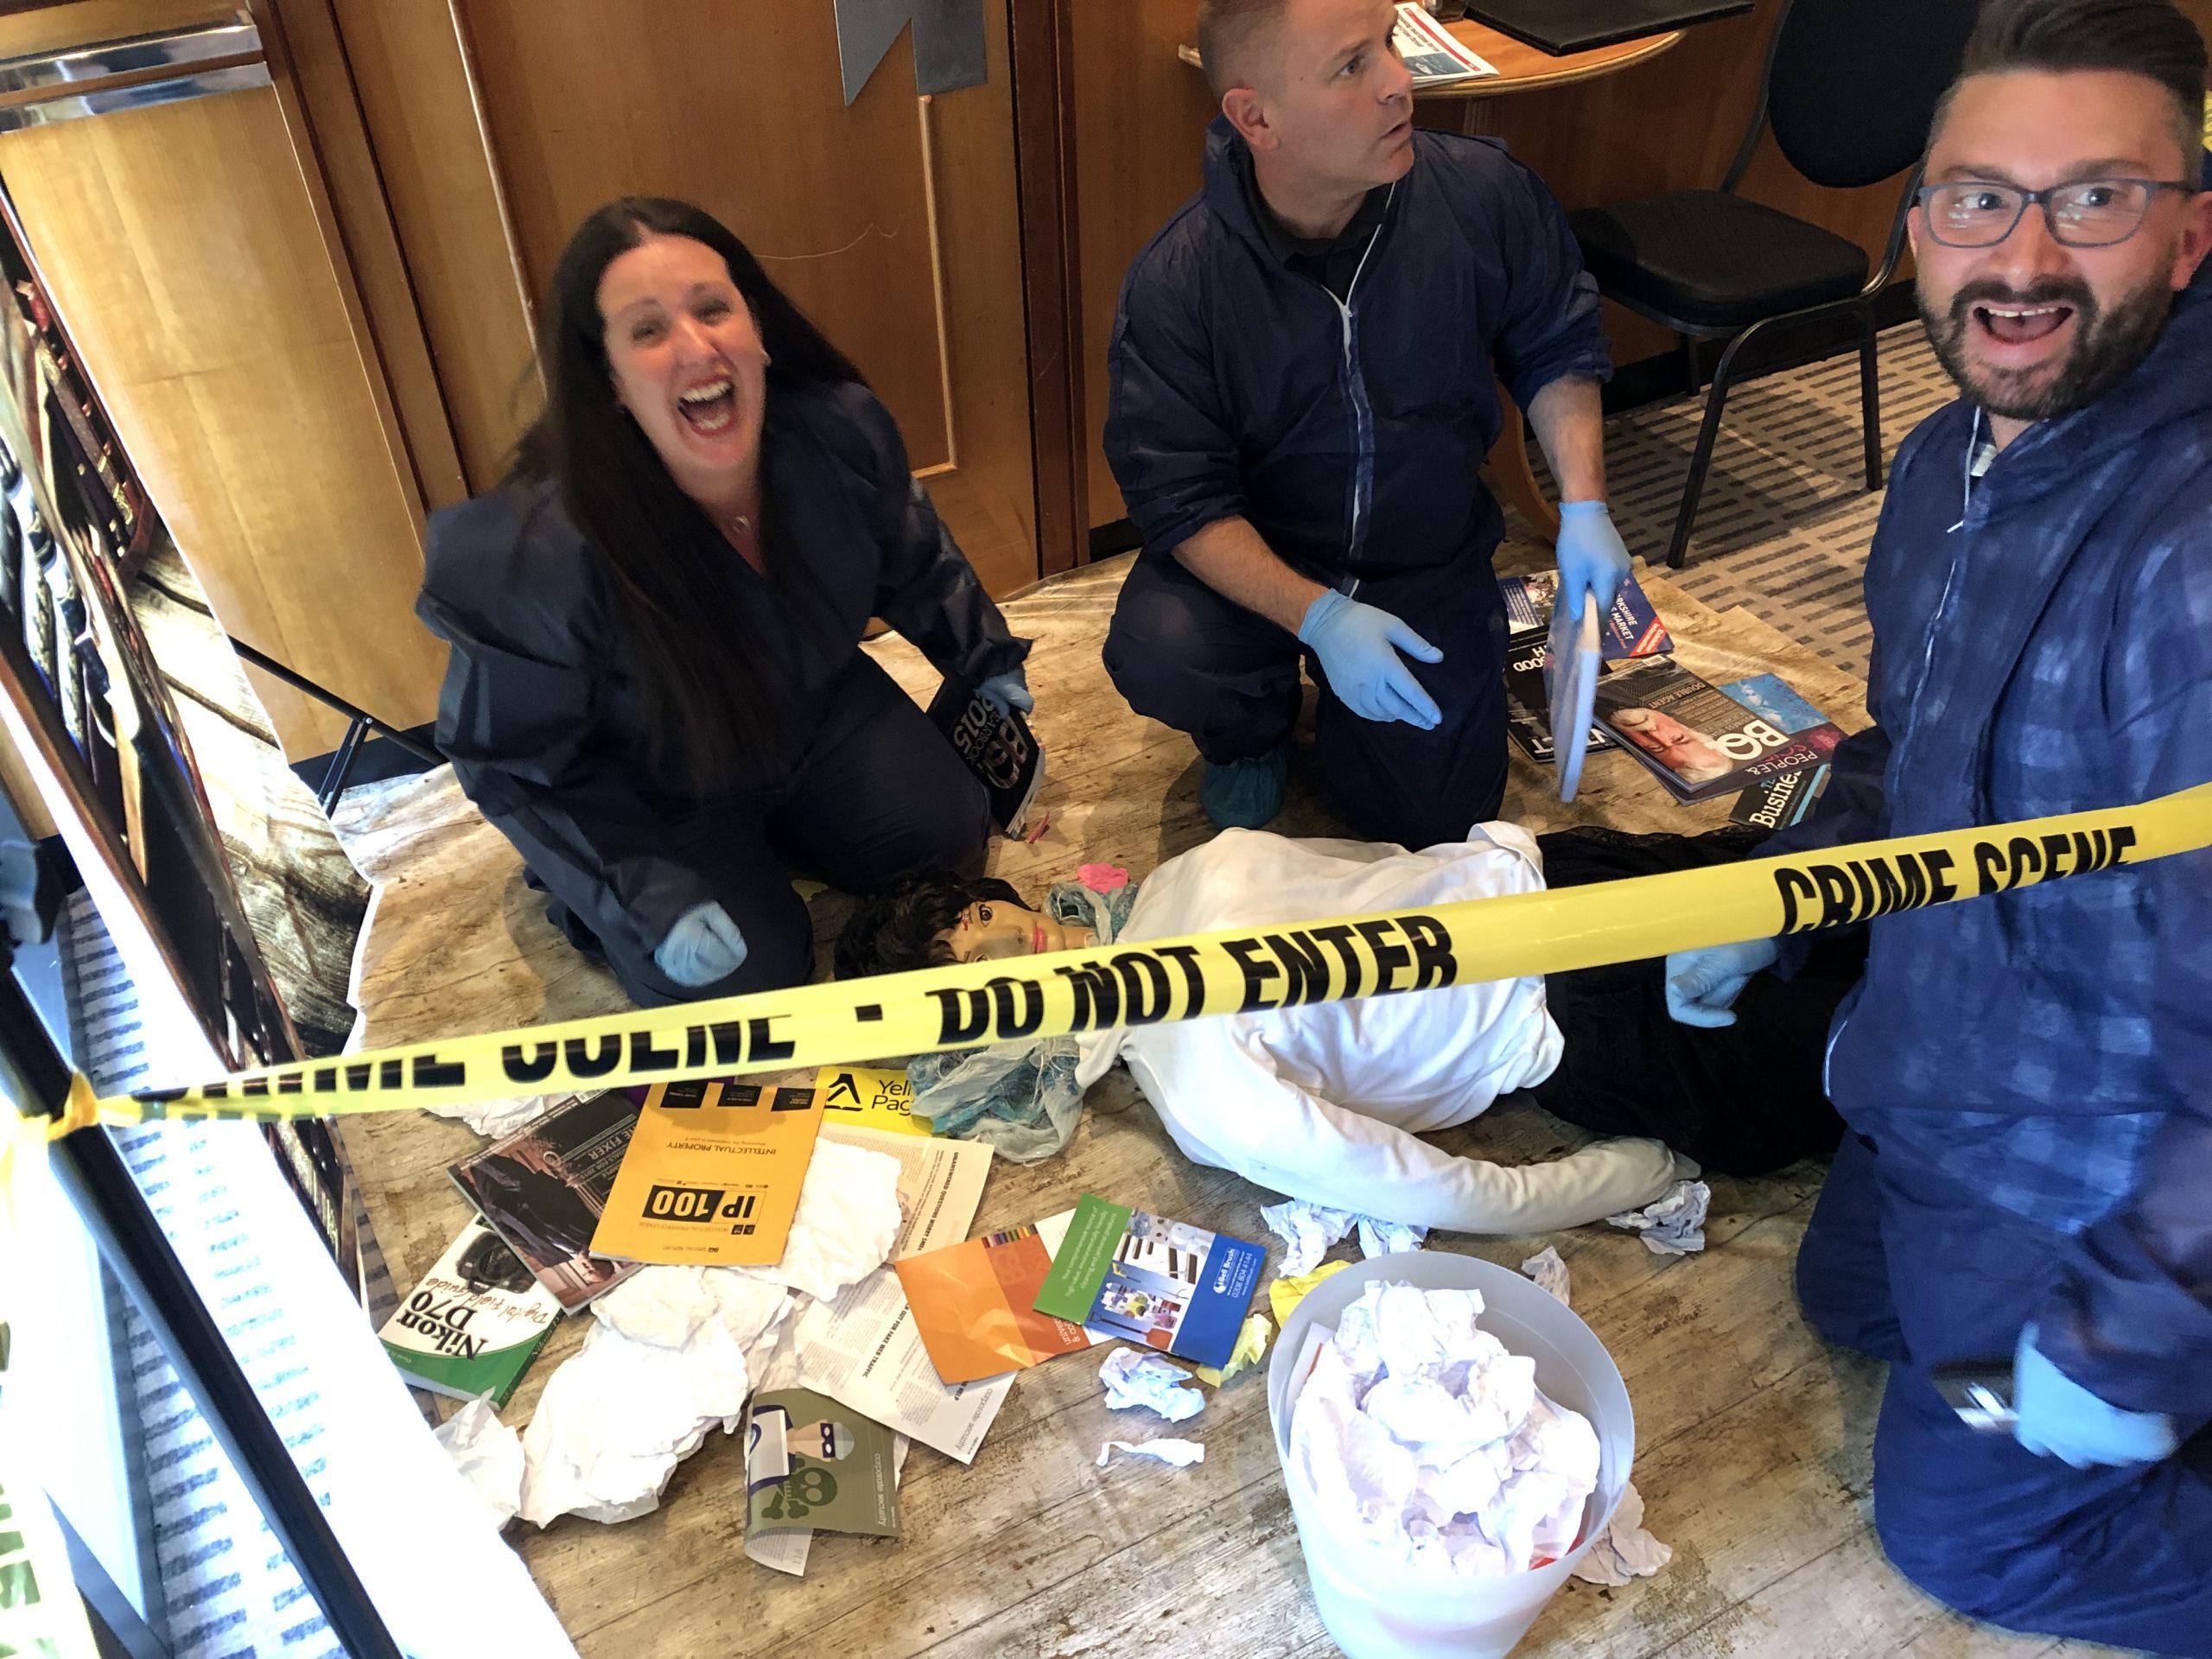 CSI Training and Events - ITV signpost Delegates examining a crime scene at a CSI team building event